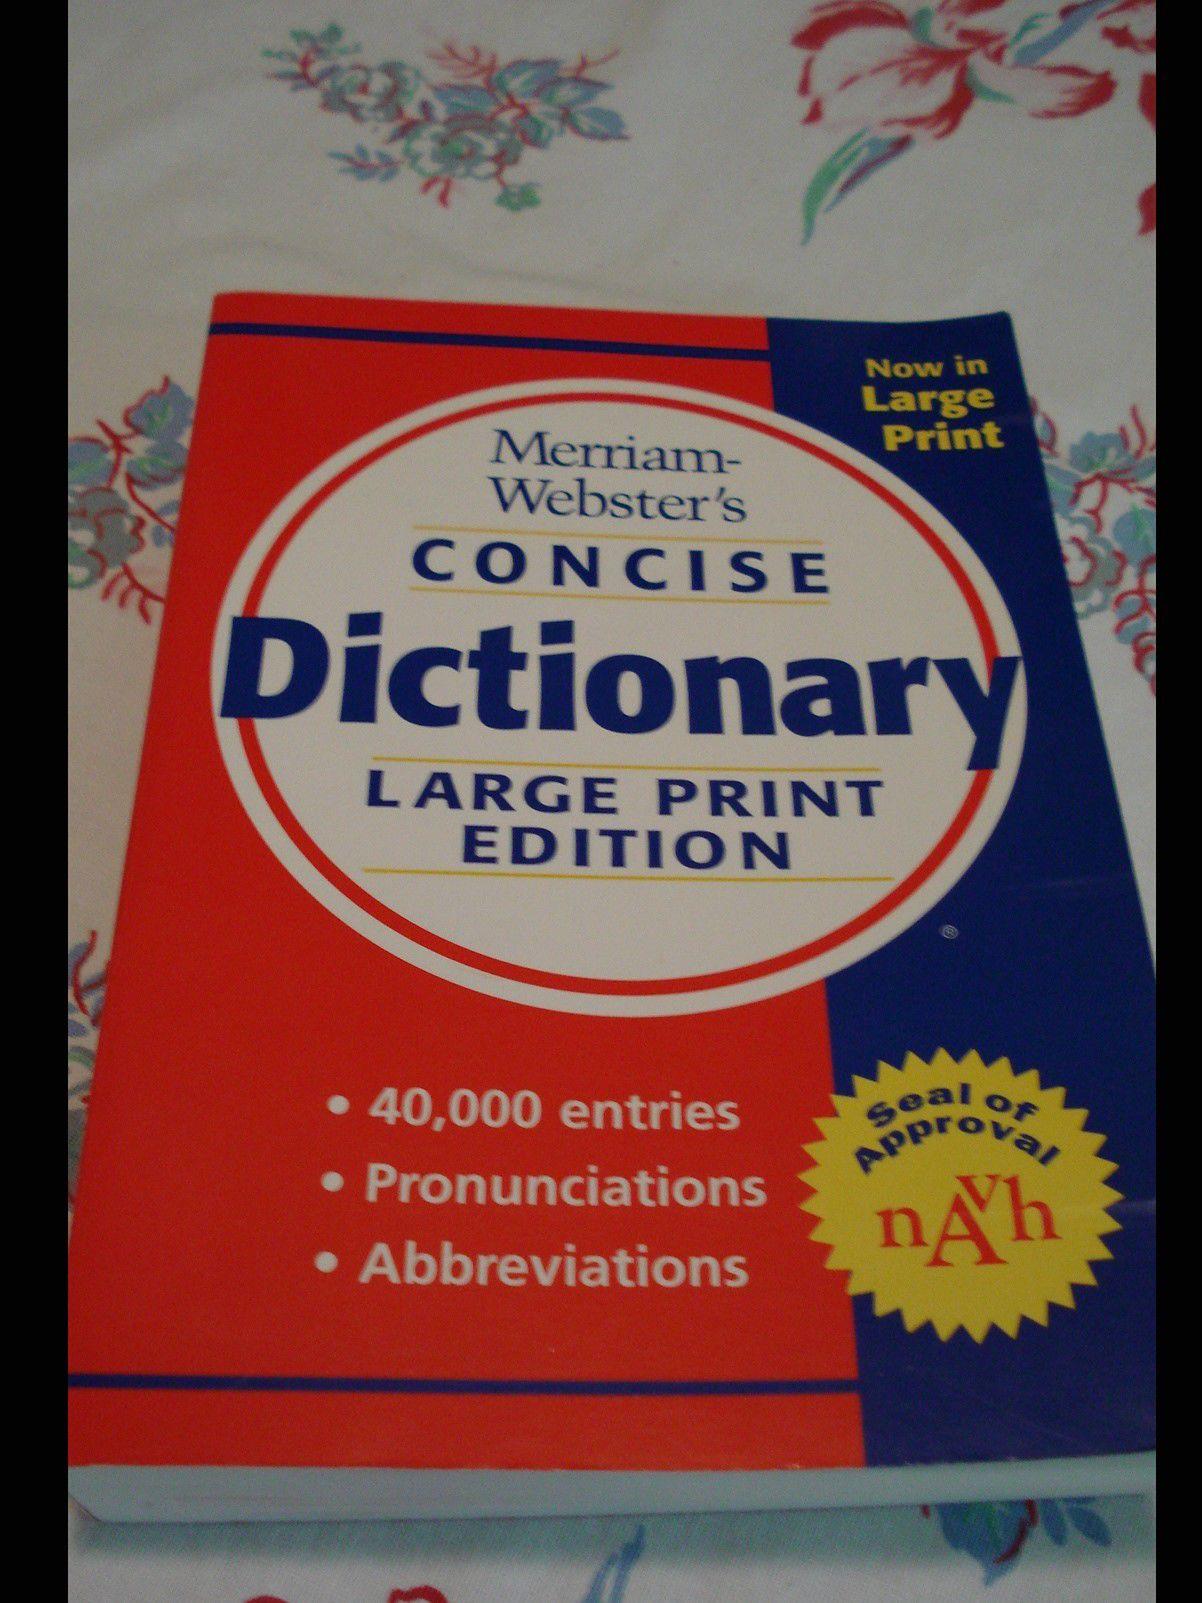 Like New Large Print Dictionary image 1